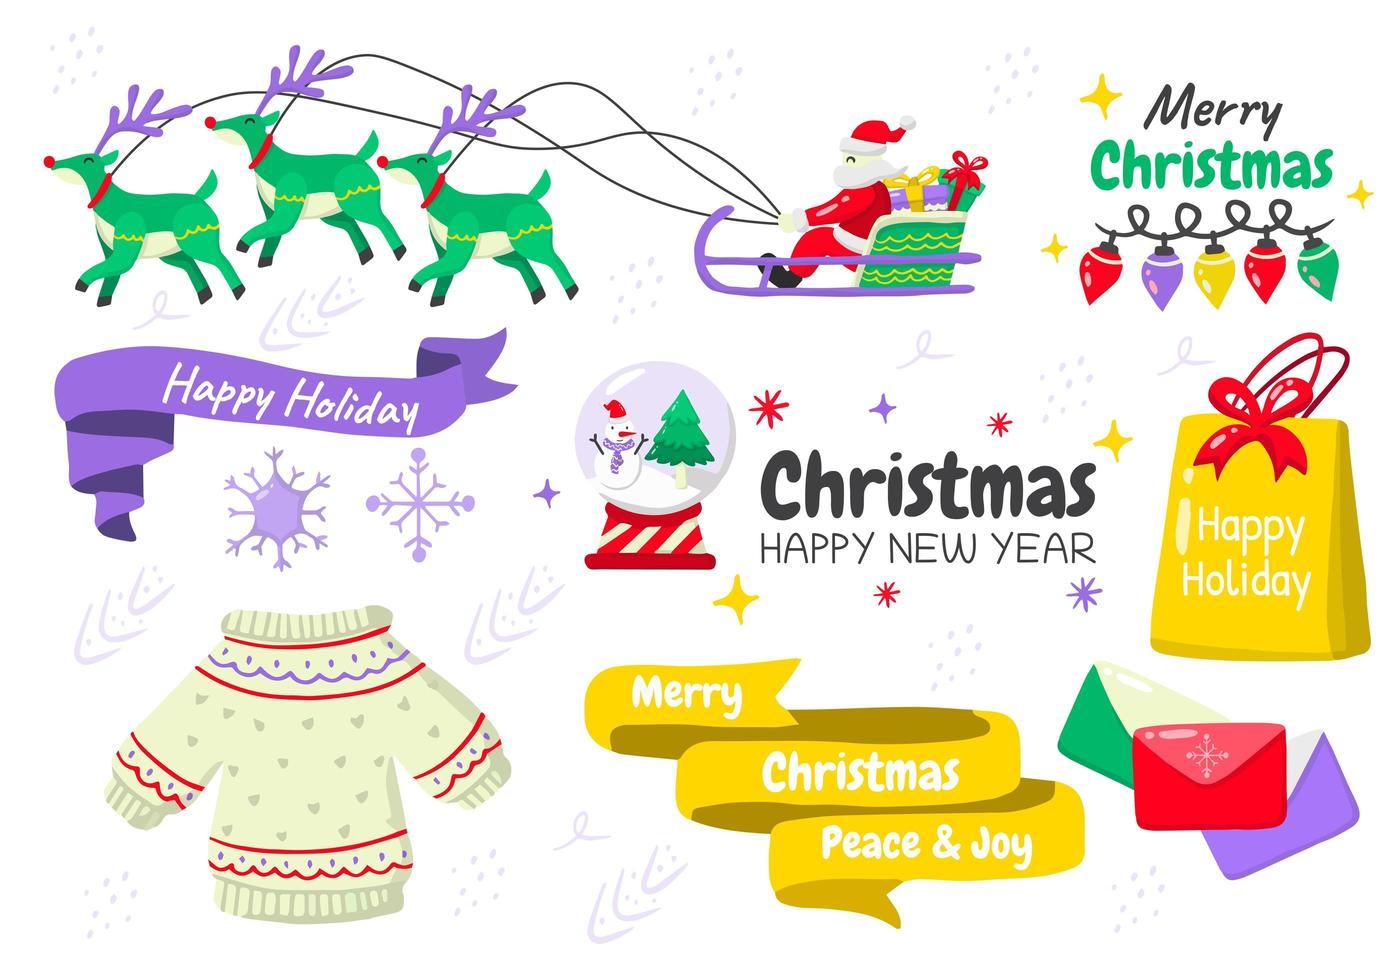 tecknad stil jul element set vektor